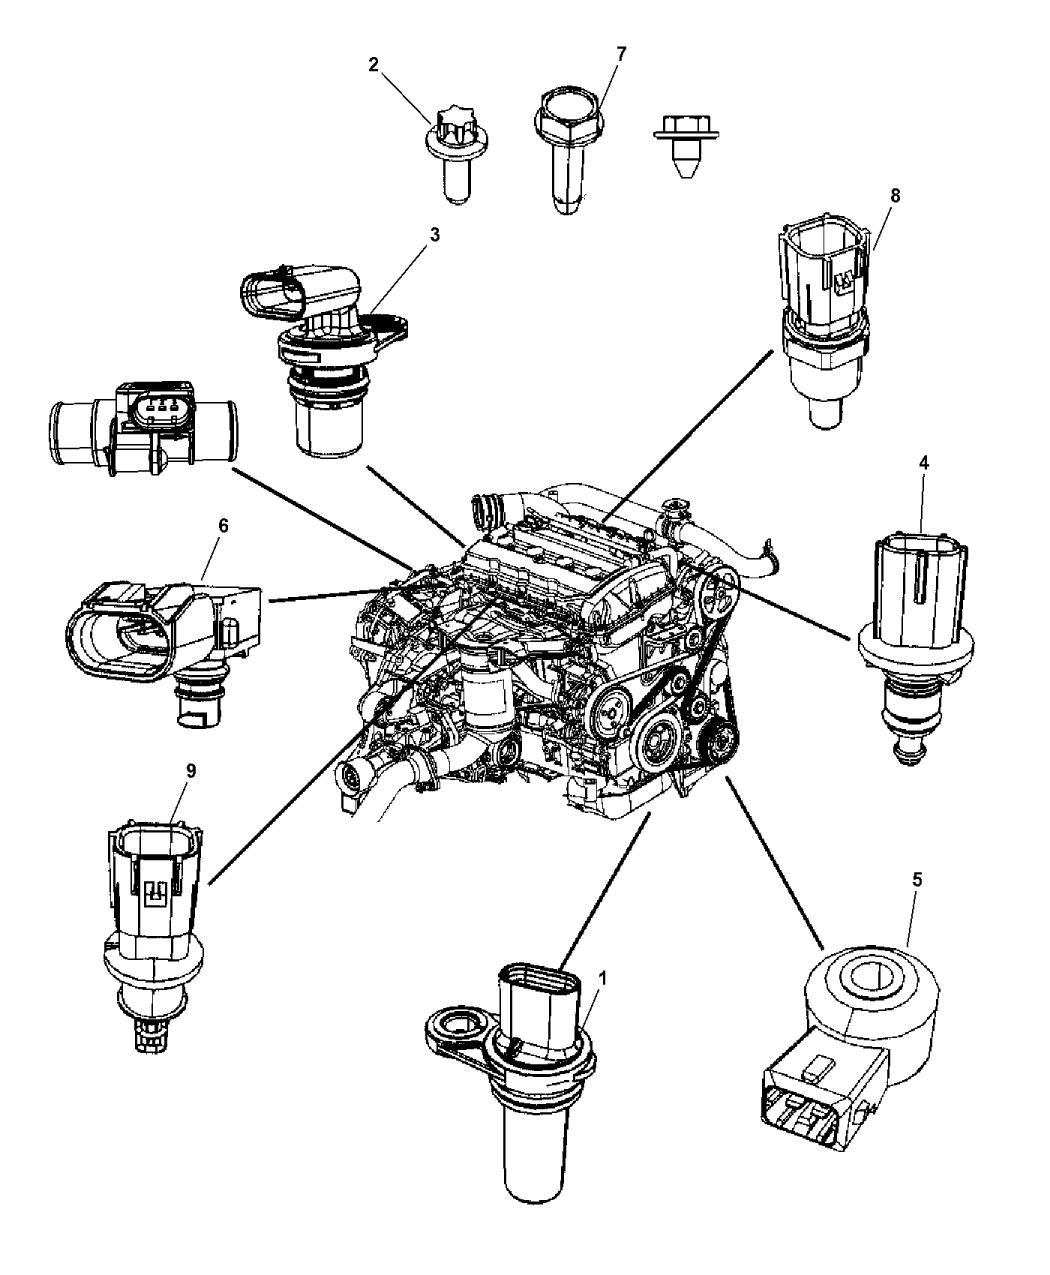 Throttle Position Sensor Jeep Patriot: 2014 Jeep Patriot Sensors